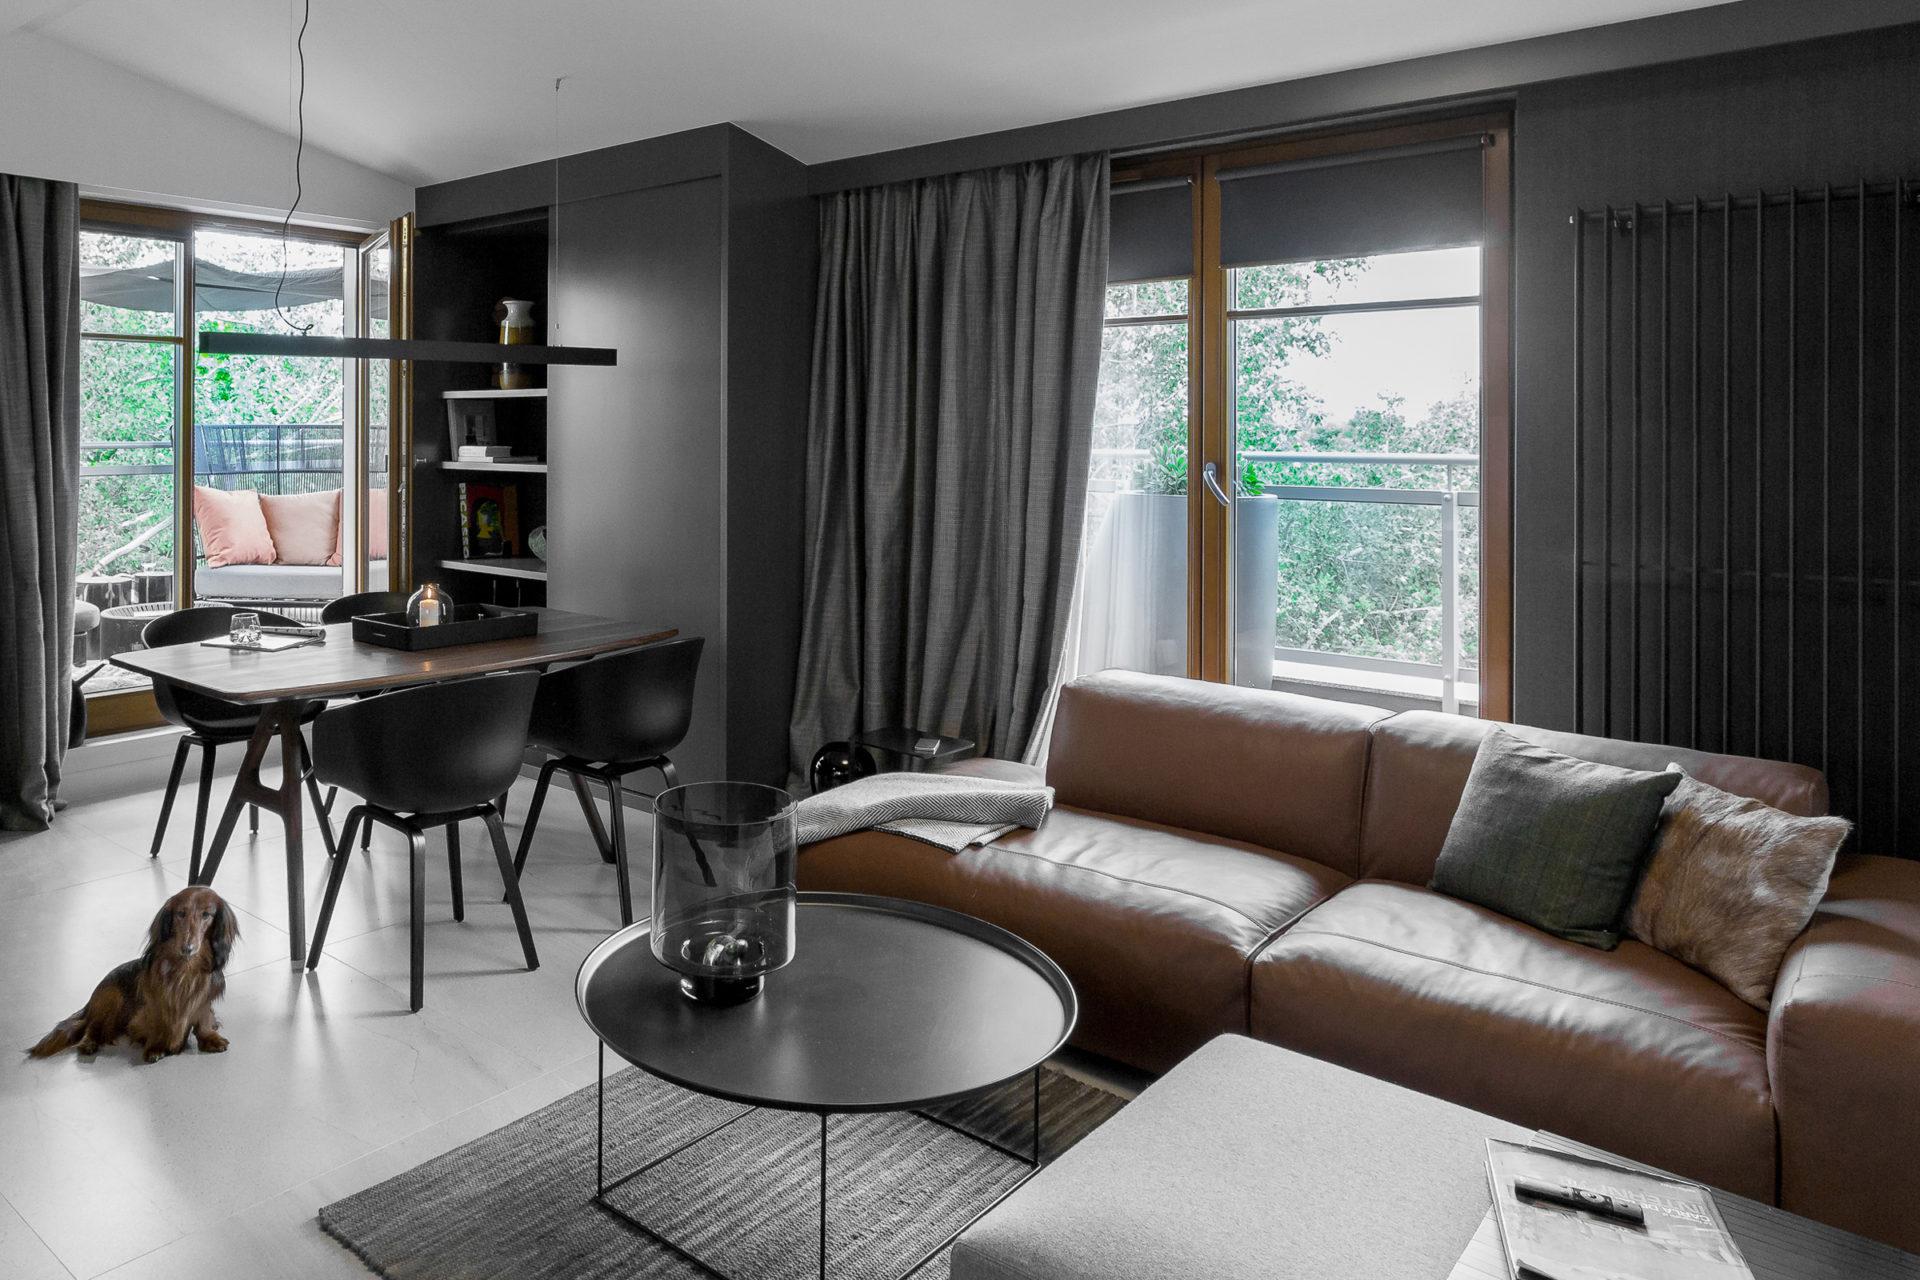 Apartament w Sopocie 2017 - 01